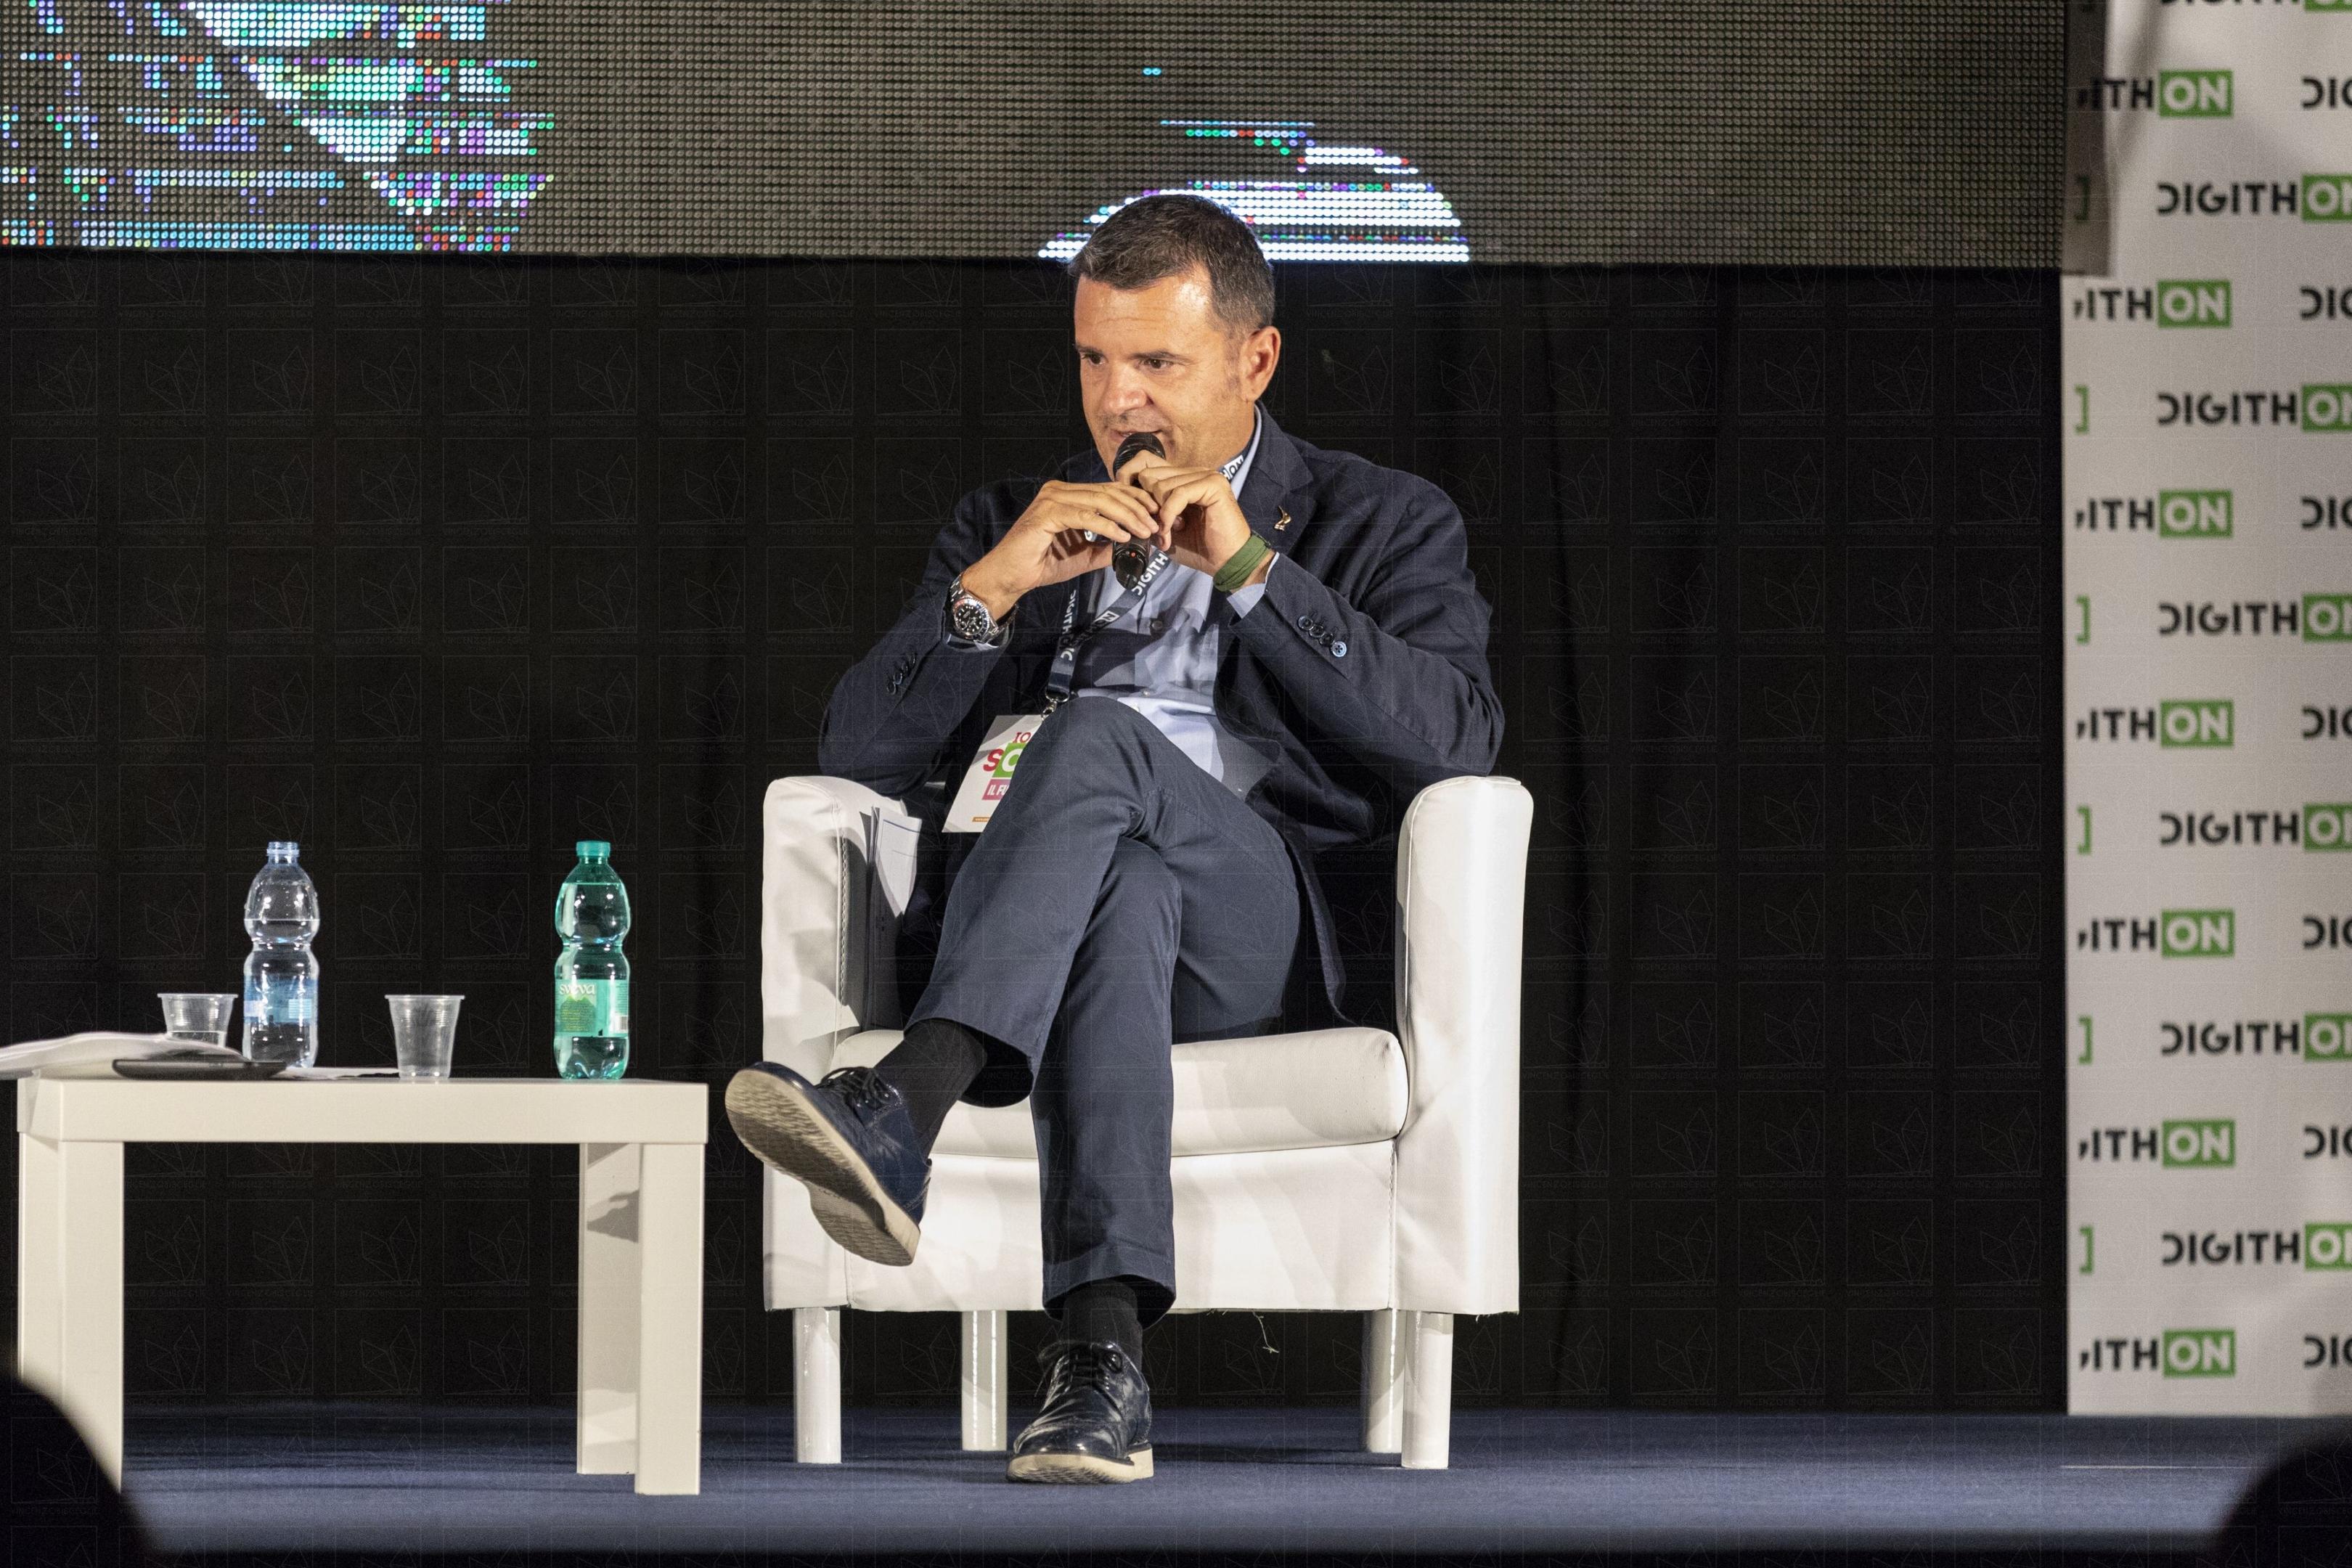 Gian Marco Centinaio al Digithon 2018 a Bisceglie